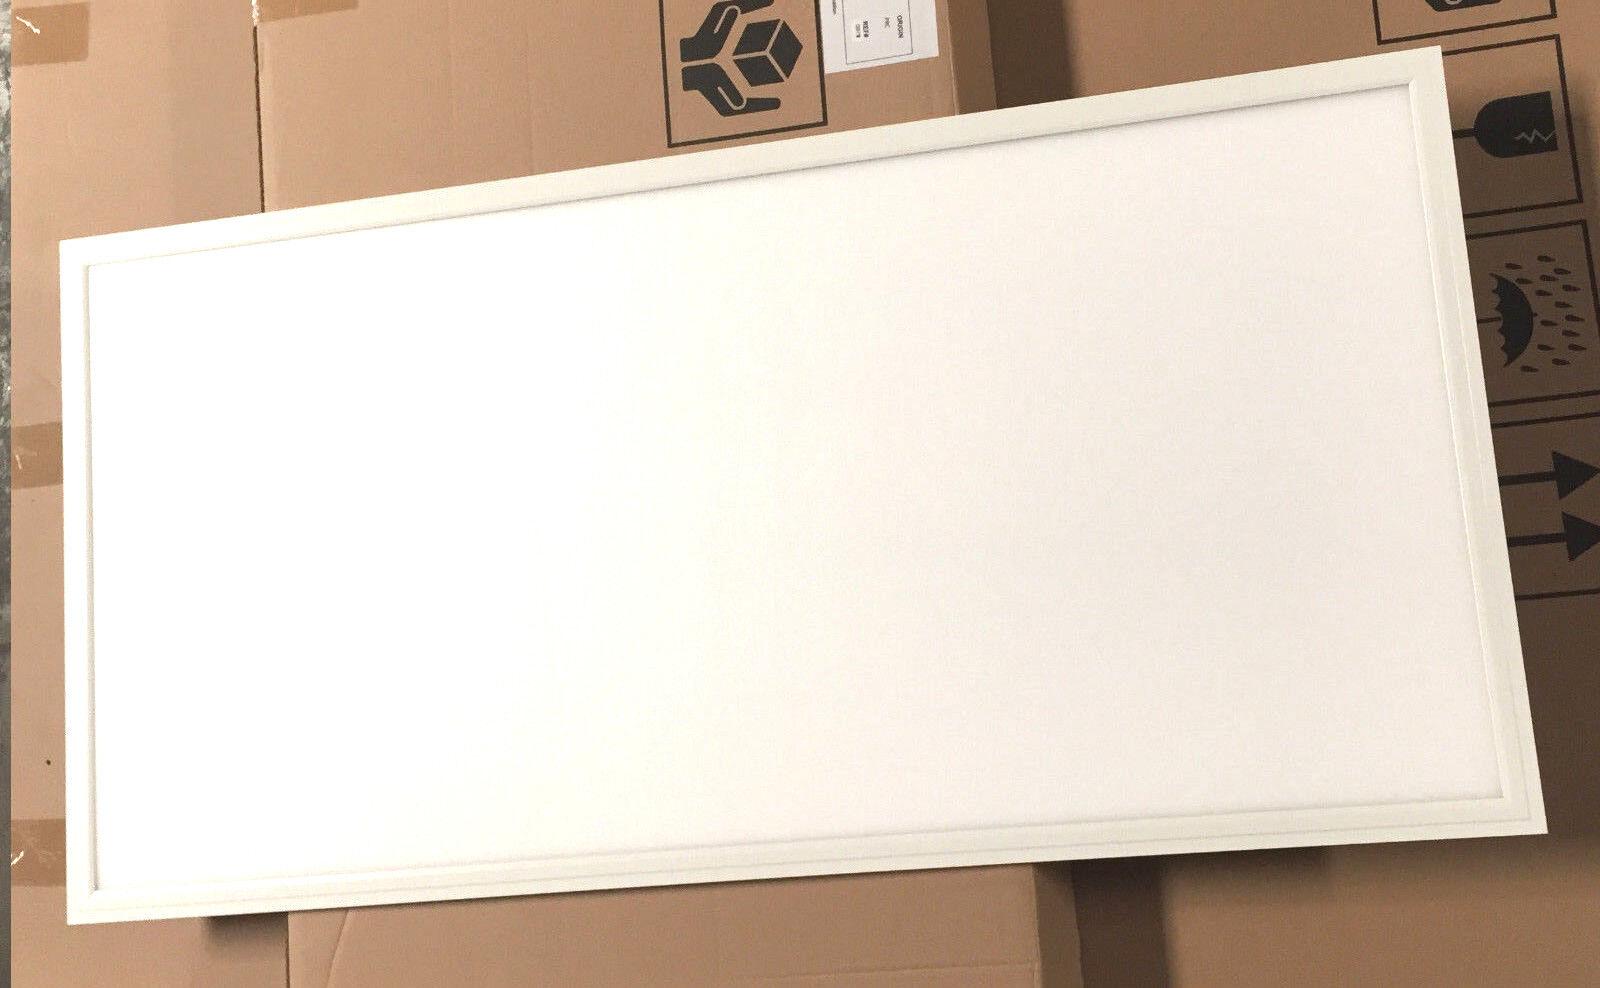 1pc UL DLC 105lm W 50W LED Drop Ceiling 2x4' 5000K Comercial Panel Light